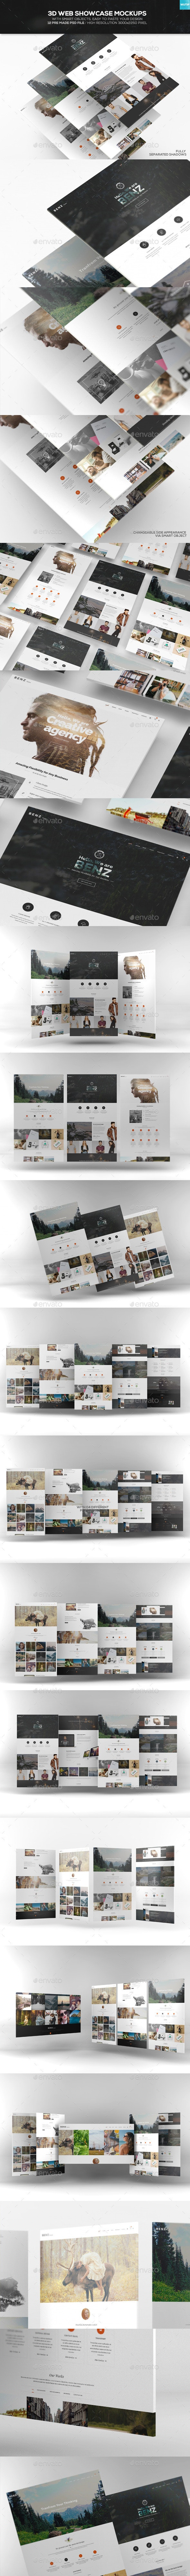 3D Web Showcase Mockups - Website Displays